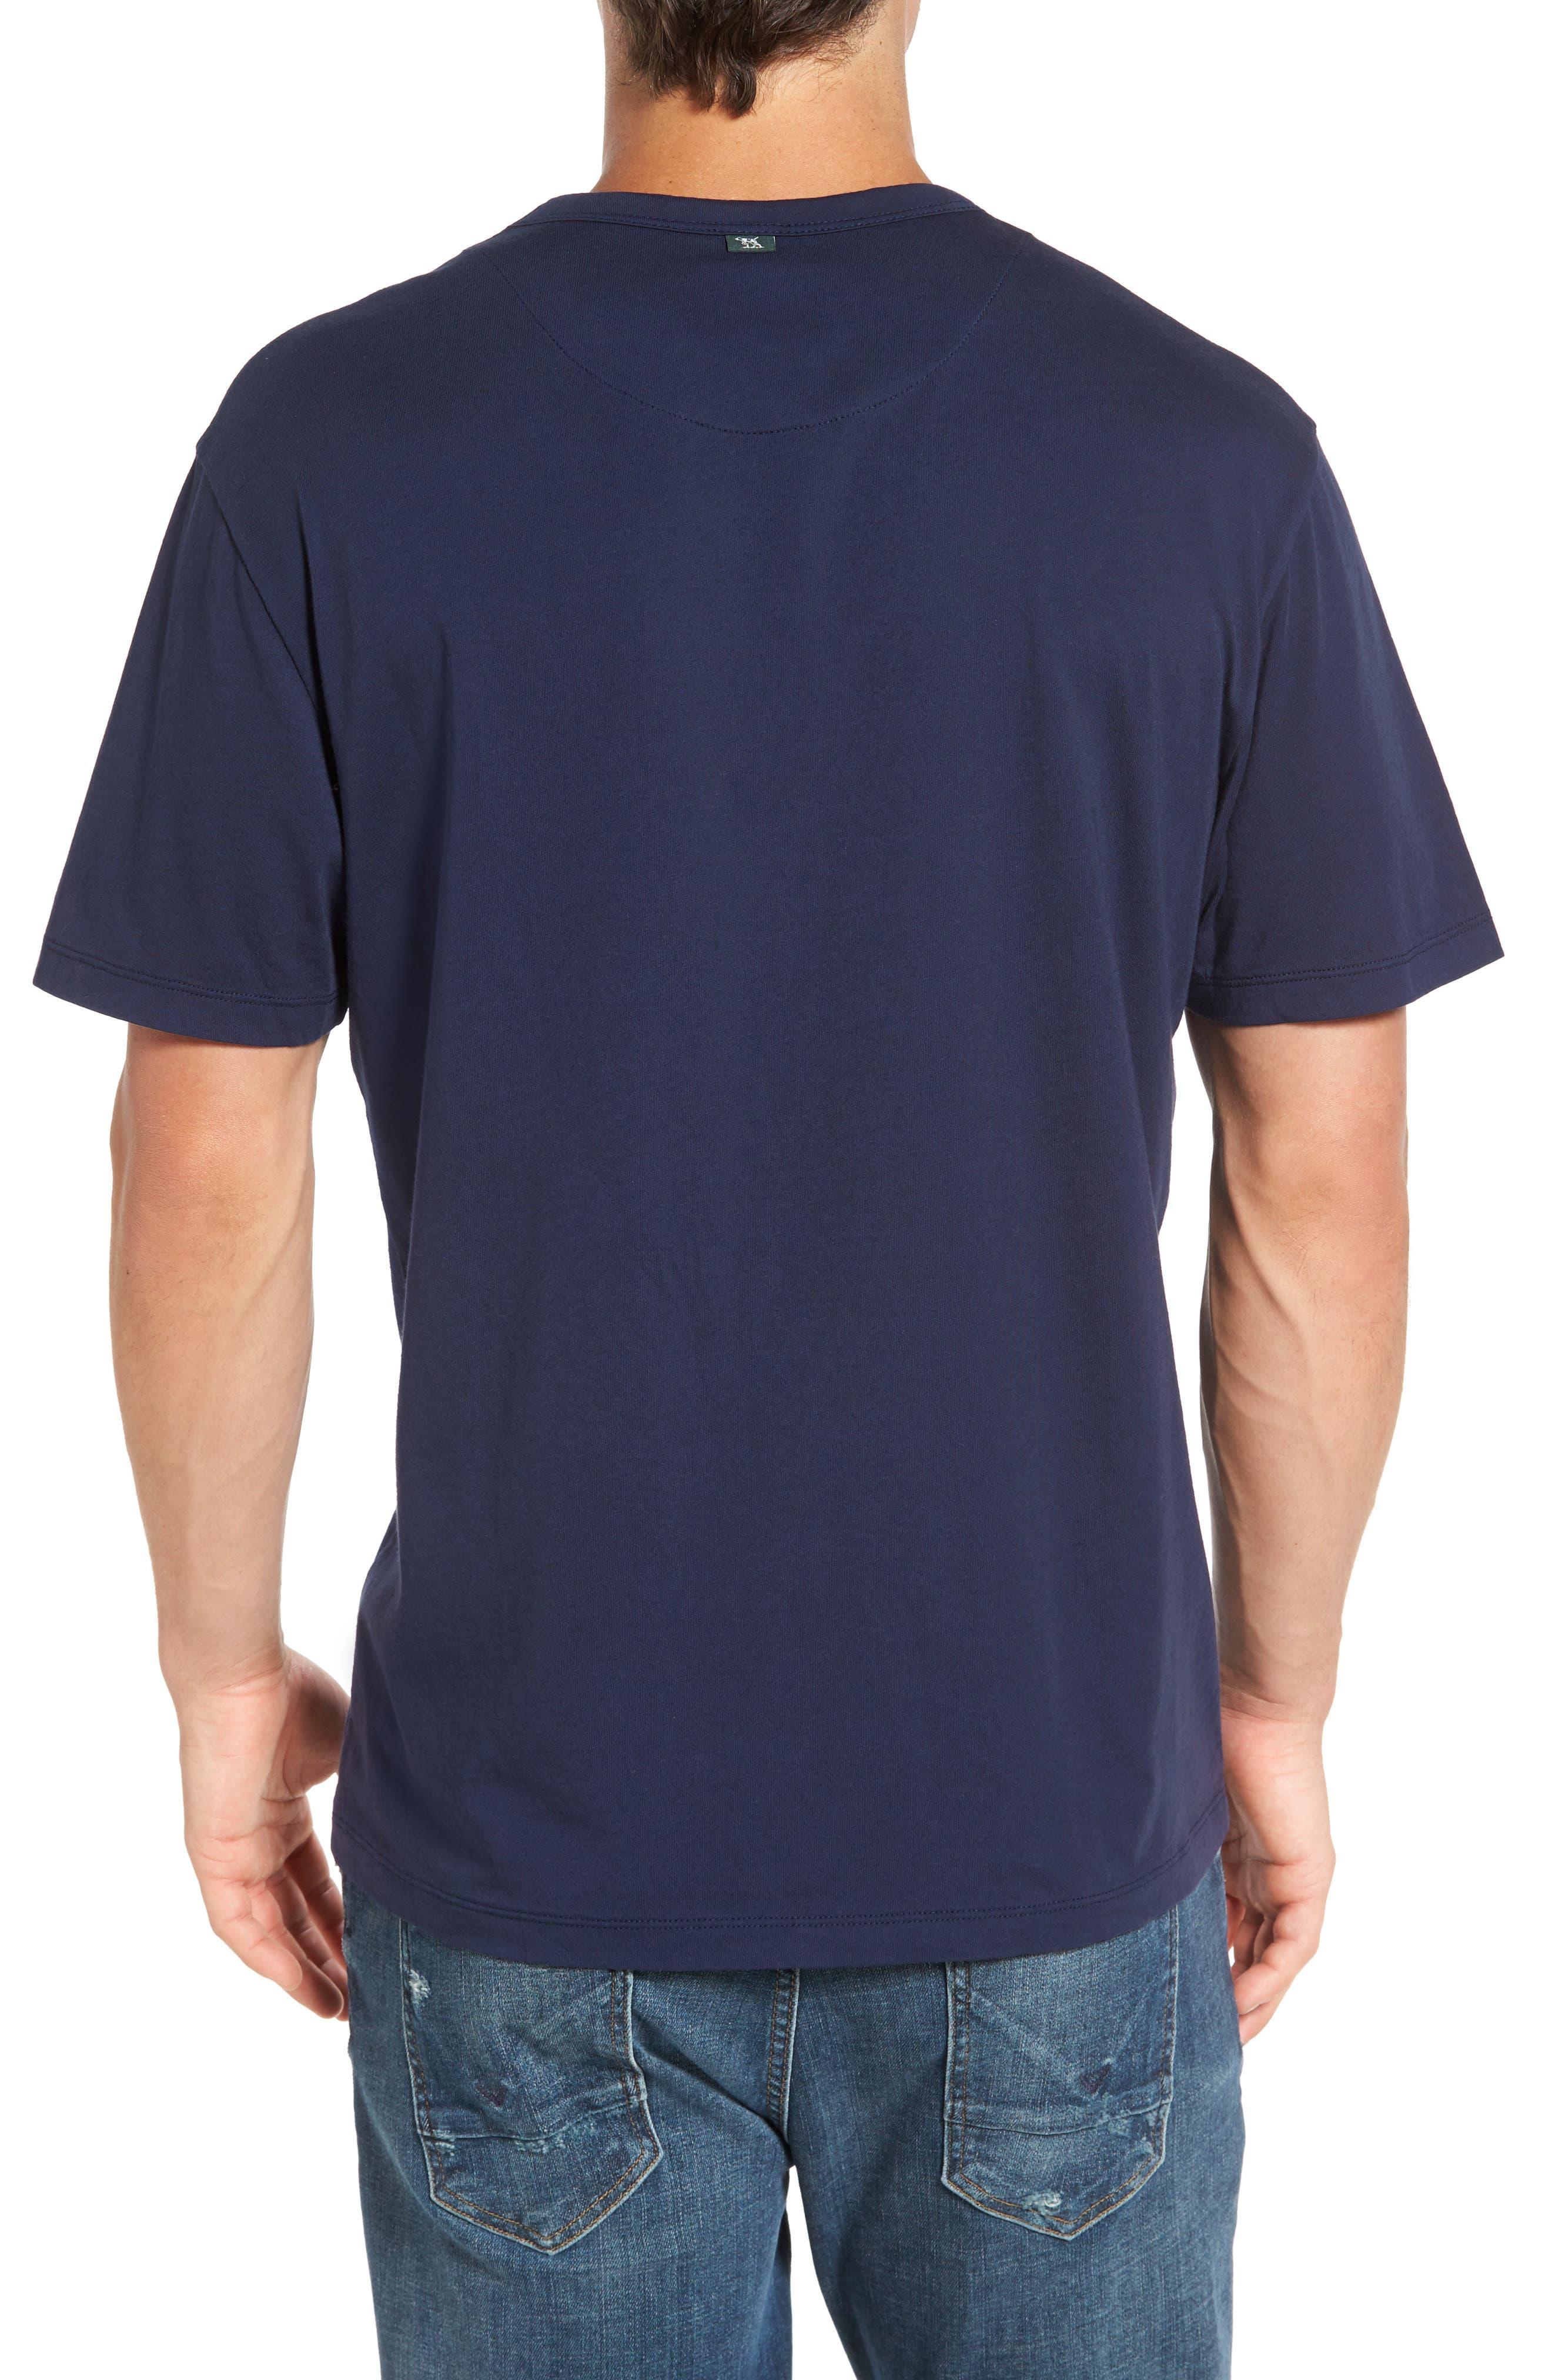 Spinnaker Bay Sports Fit Crewneck T-Shirt,                             Alternate thumbnail 8, color,